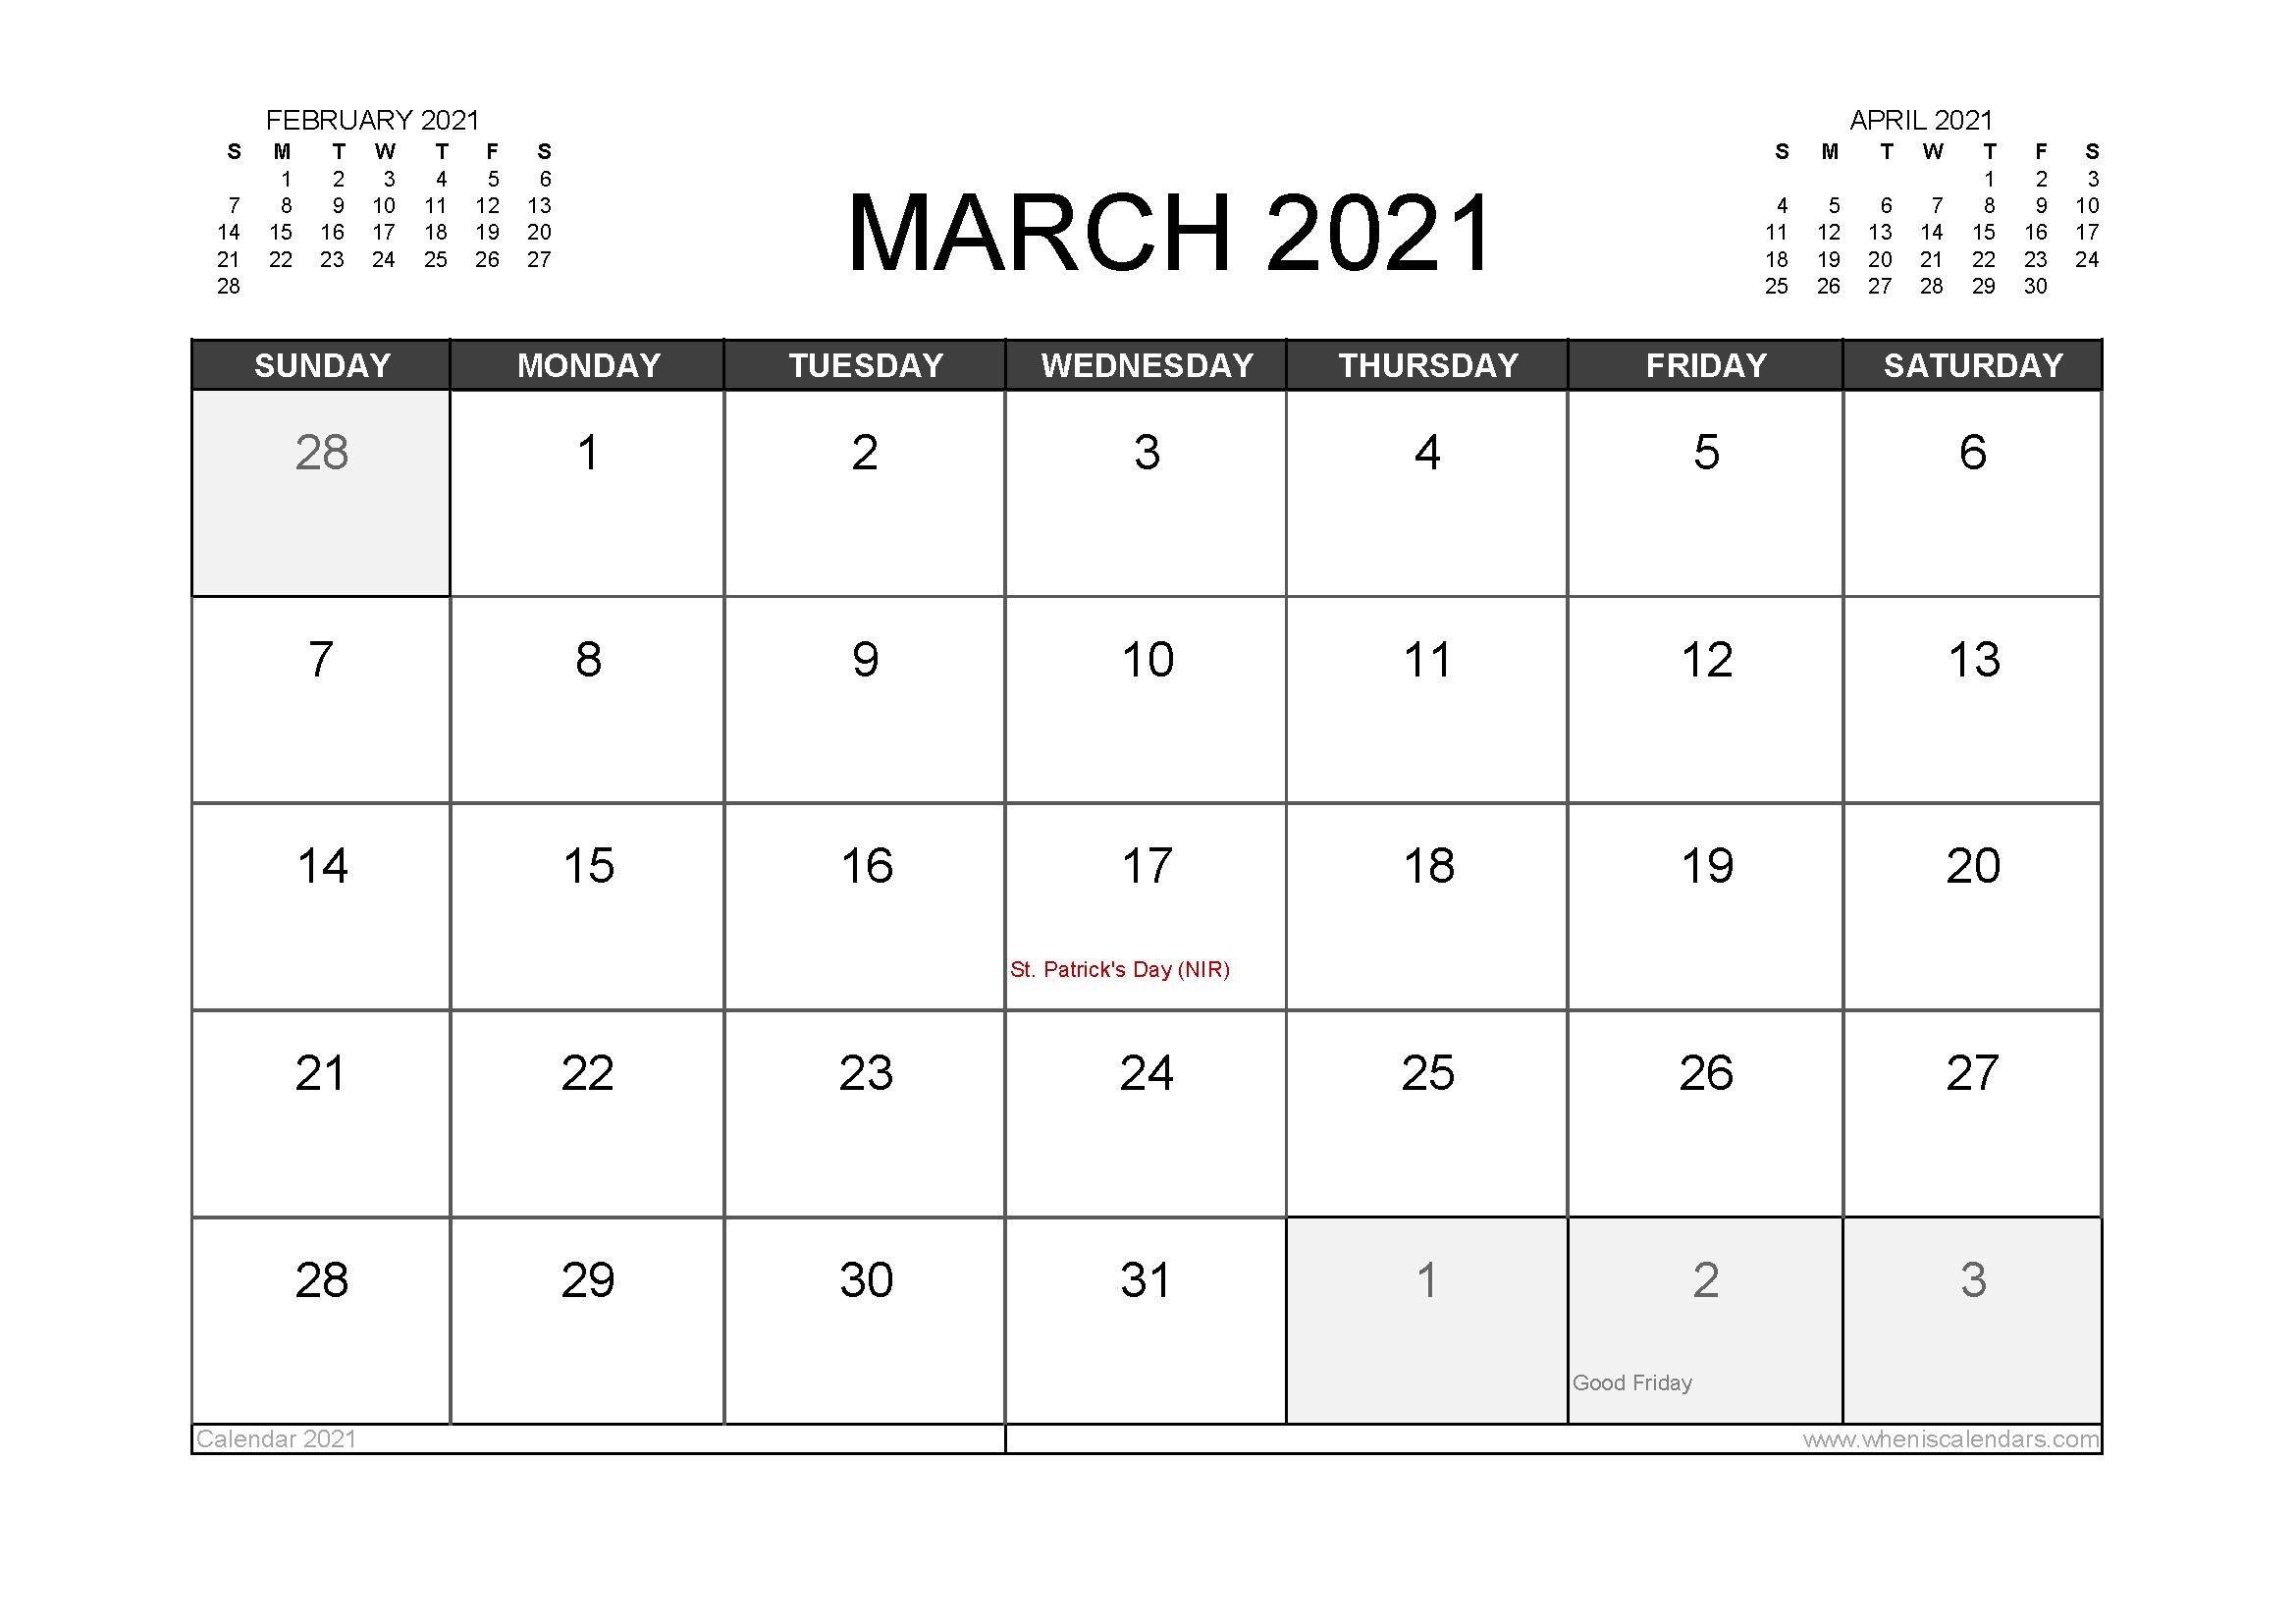 March 2021 Calendar Uk With Holidays In 2020 2021 Calendar Calendar Uk Calendar